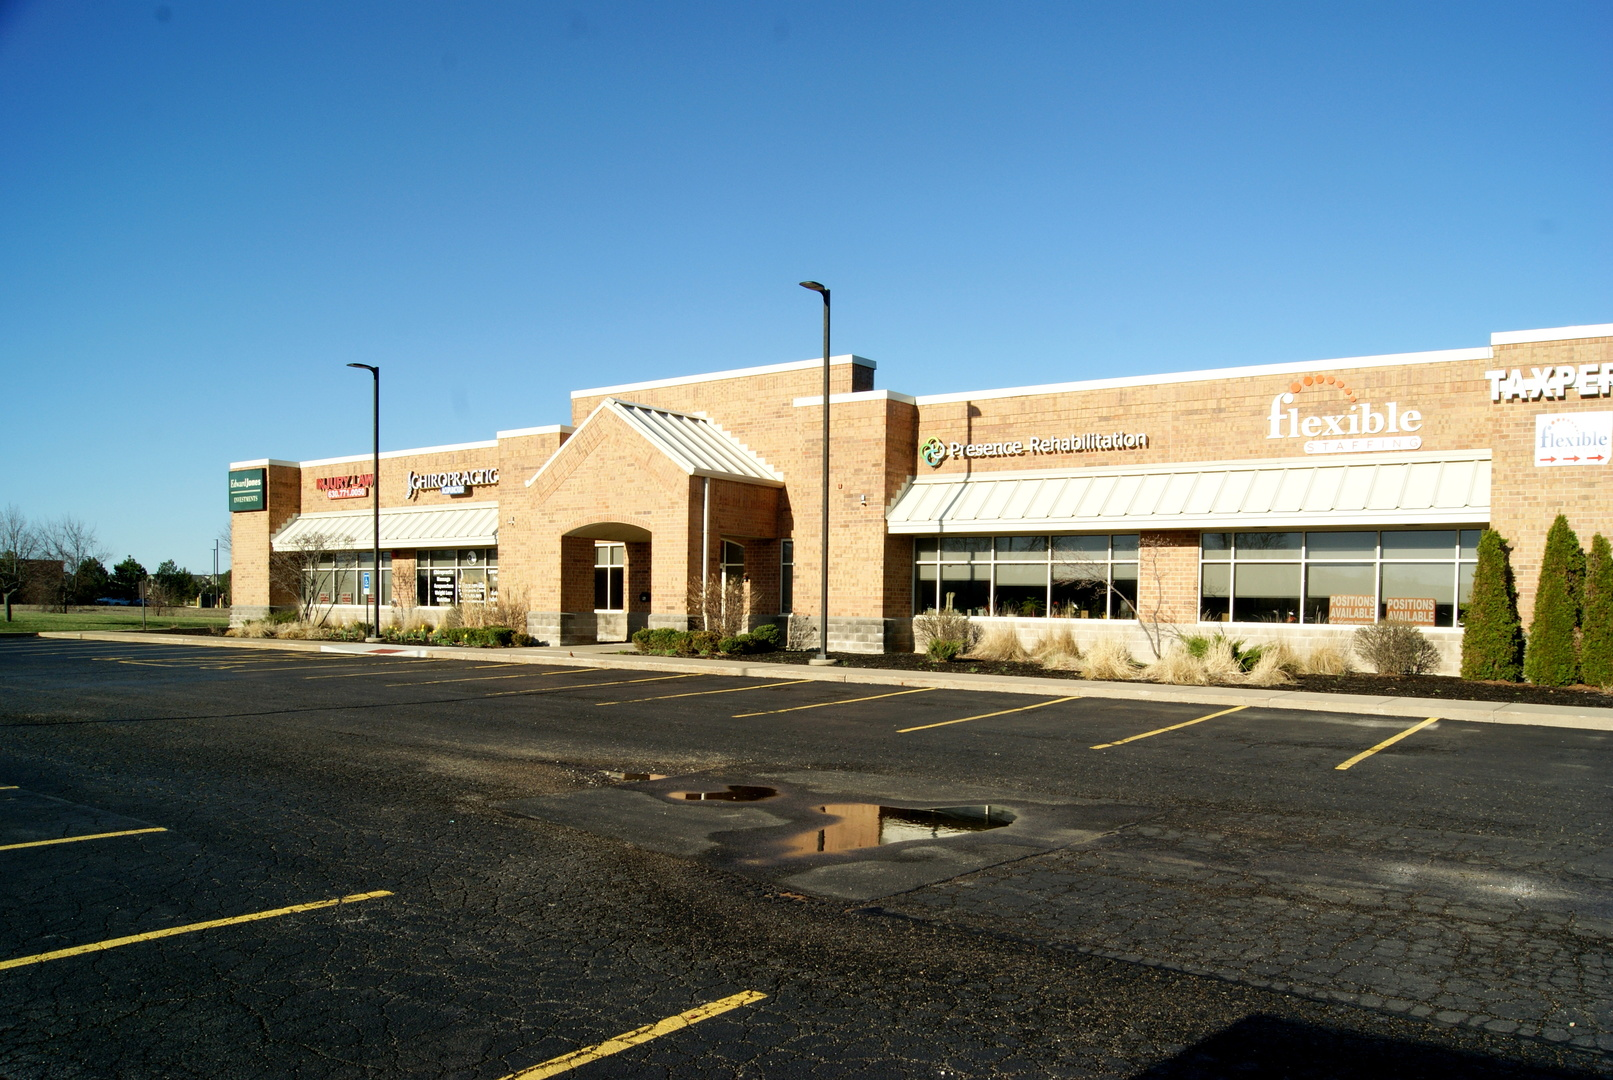 600 South Weber Road, Unit 8, Romeoville, IL, 60446 Photo 1